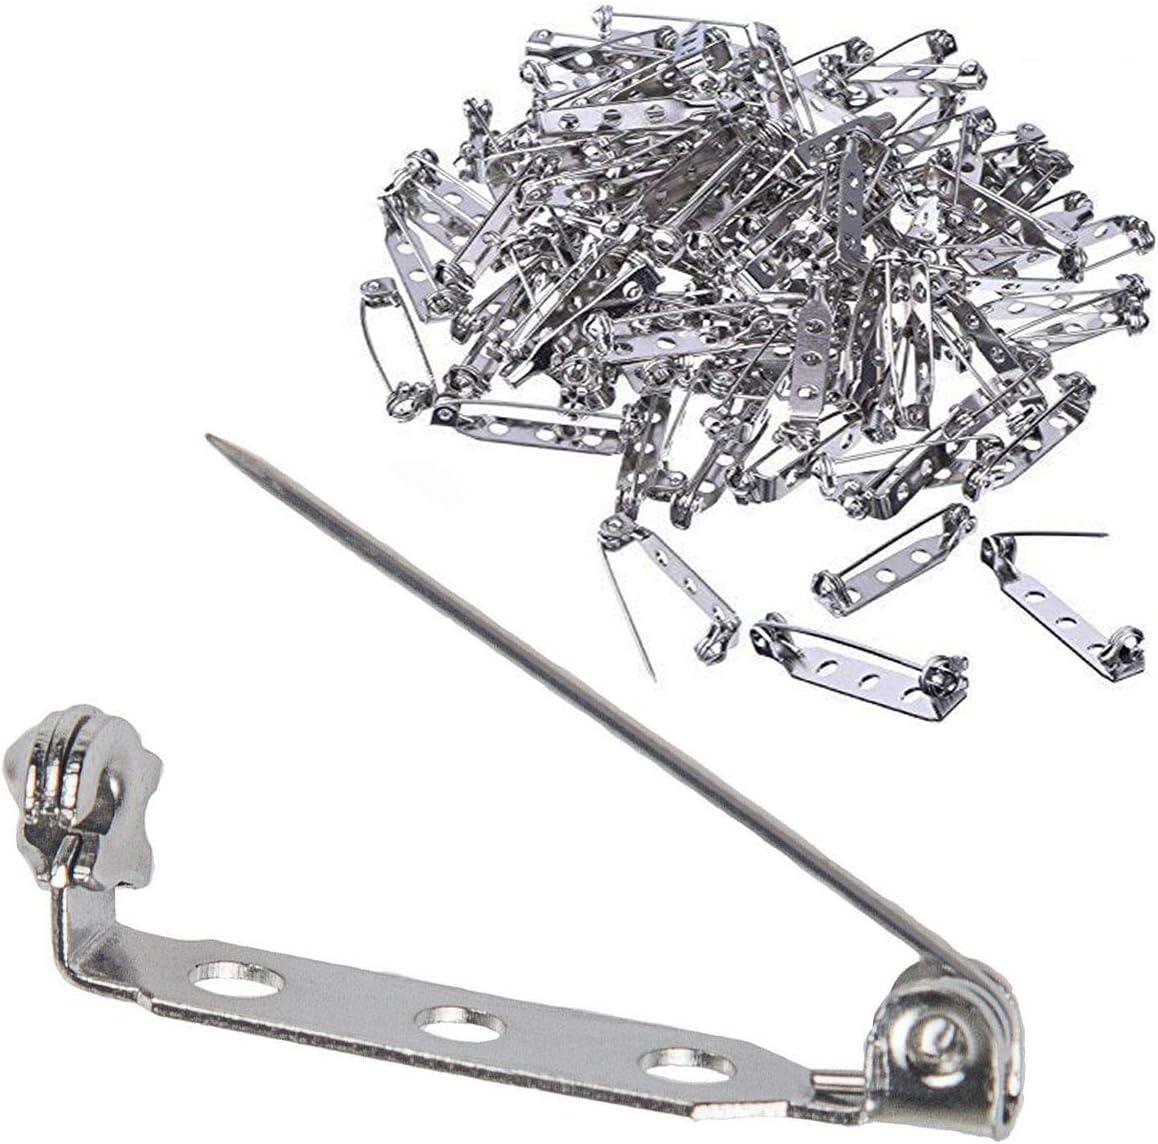 10pcs Gold Safety Pins 64mm 75mm Kilt Pins Broochs Larger Safety Pins Brooch Pin metal safety pins Bar Pins